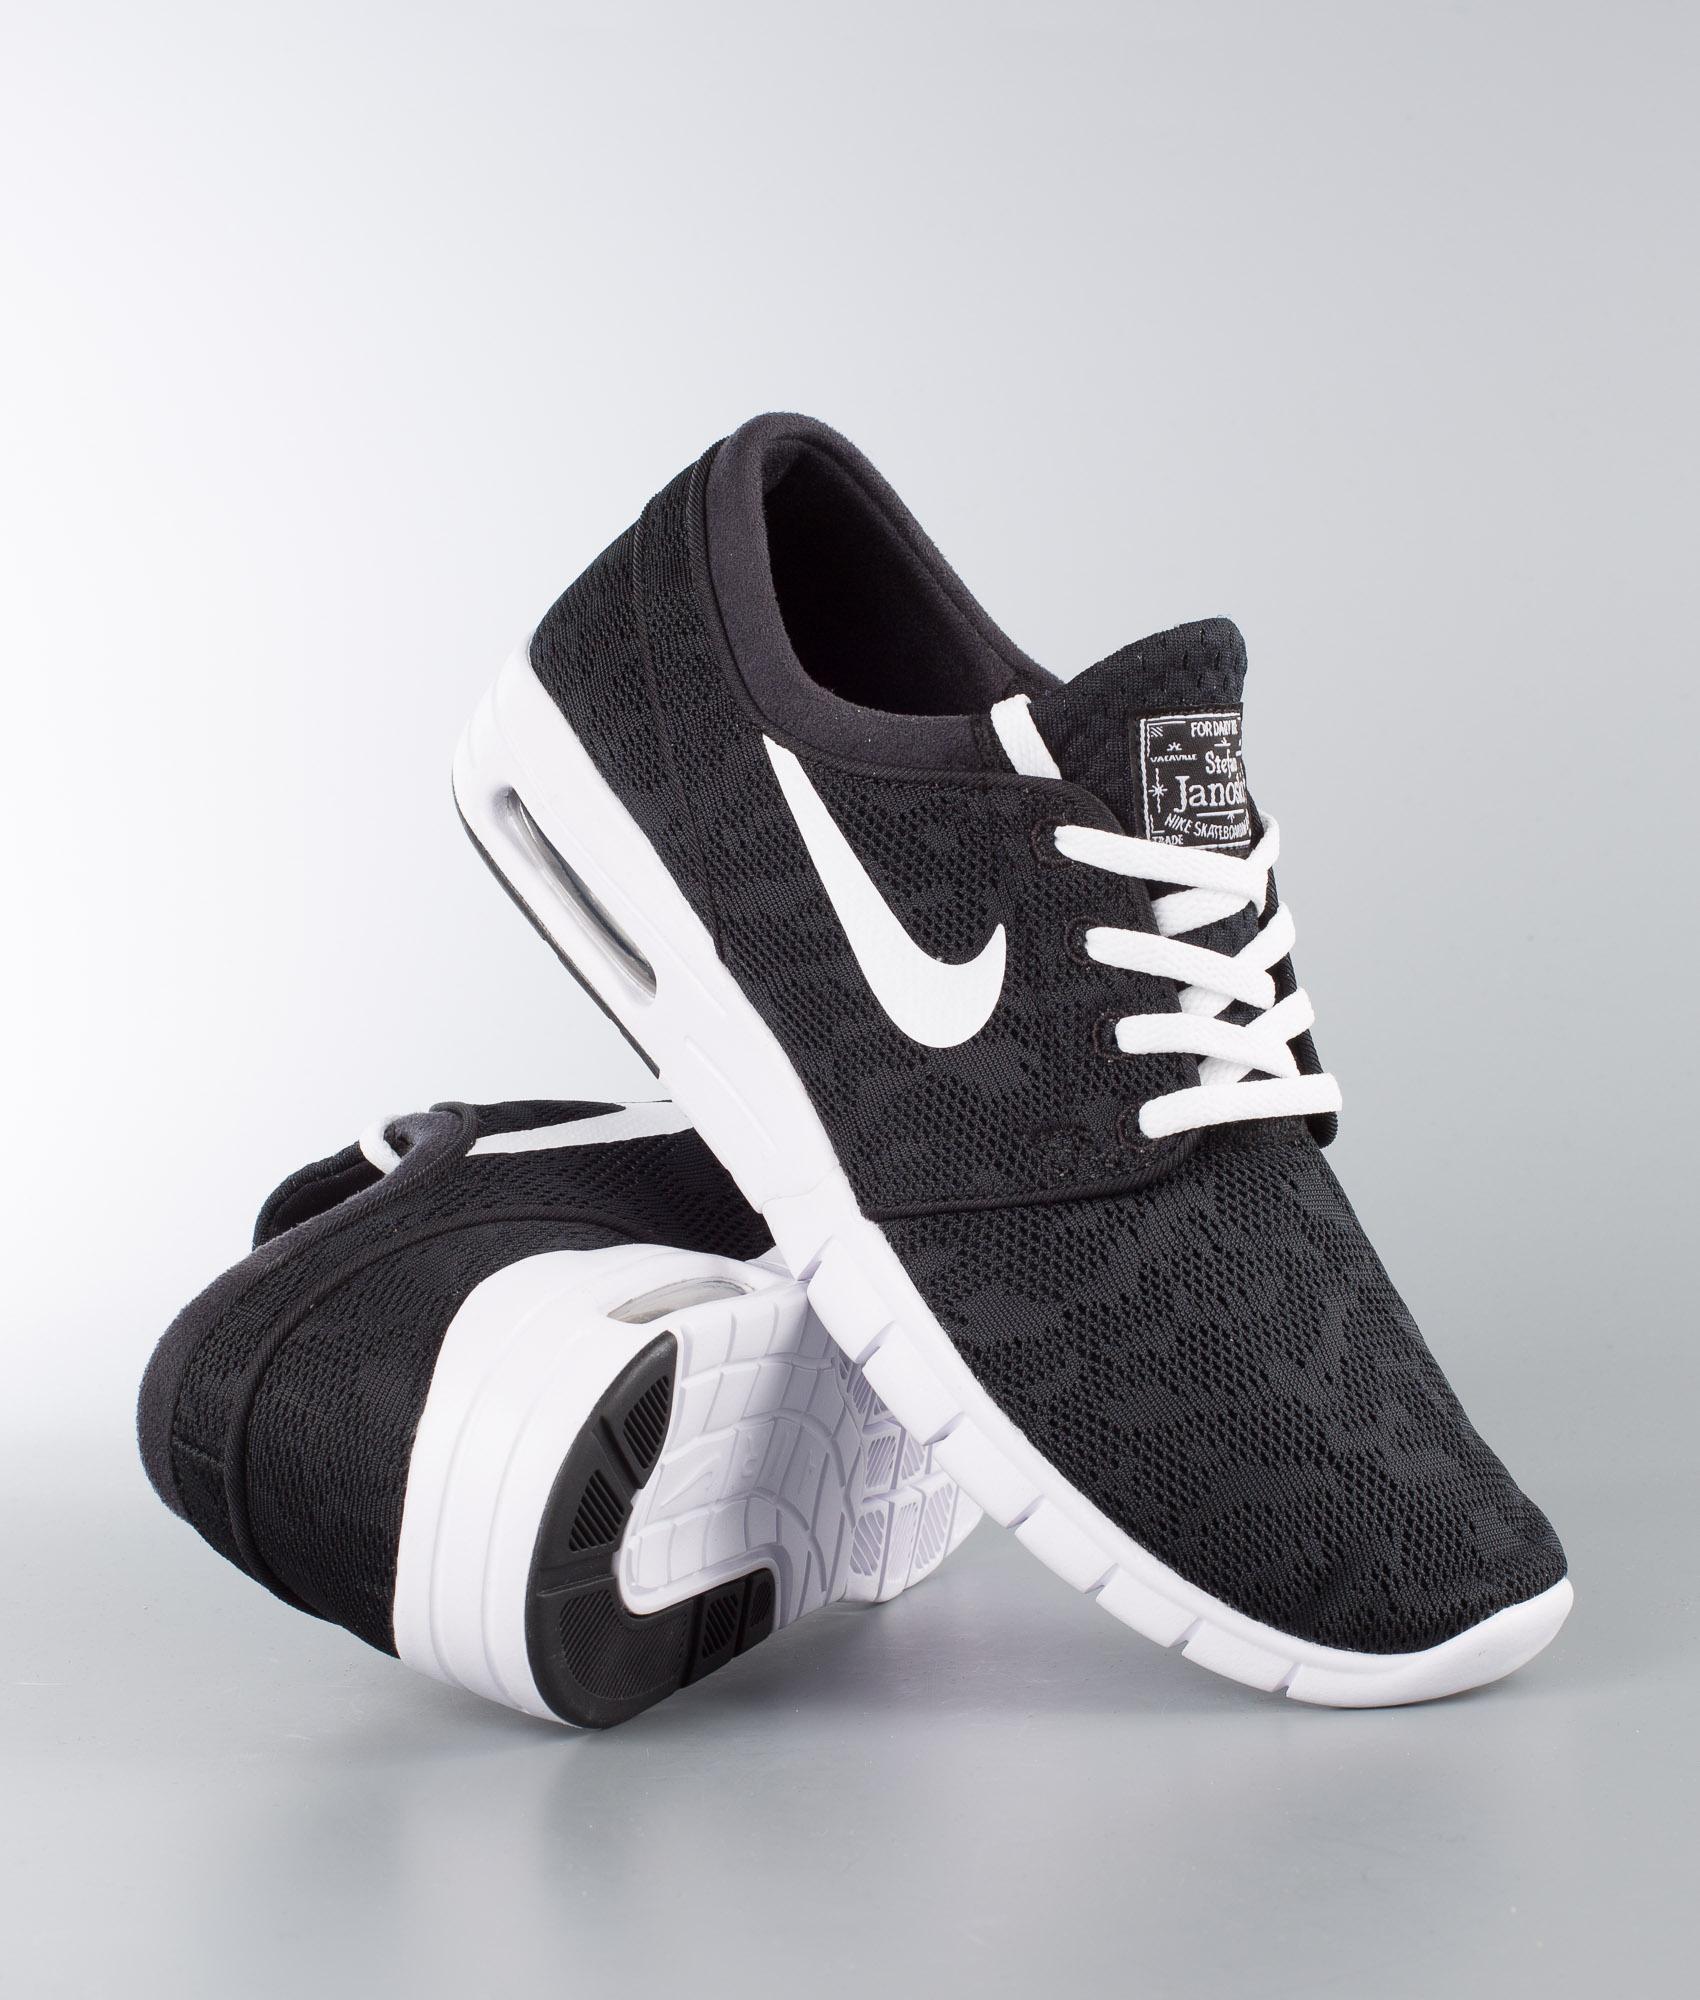 Blackwhite Janoski Ridestore ch Schuhe Nike Stefan Max w1ZapqxHOx